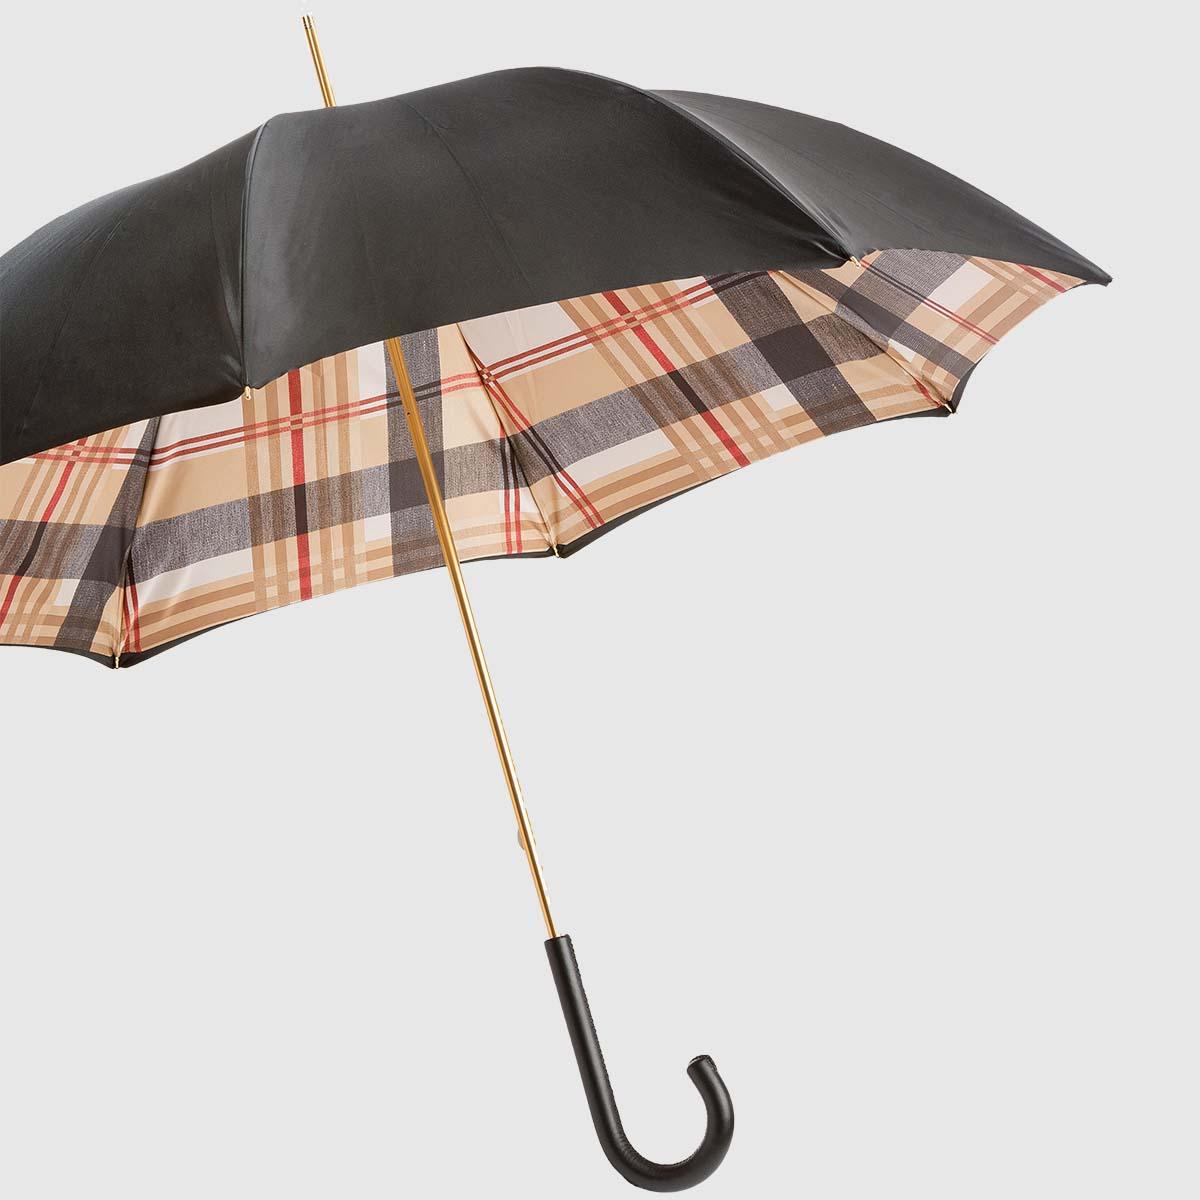 Elegant and versatile women's umbrella made by Pasotti